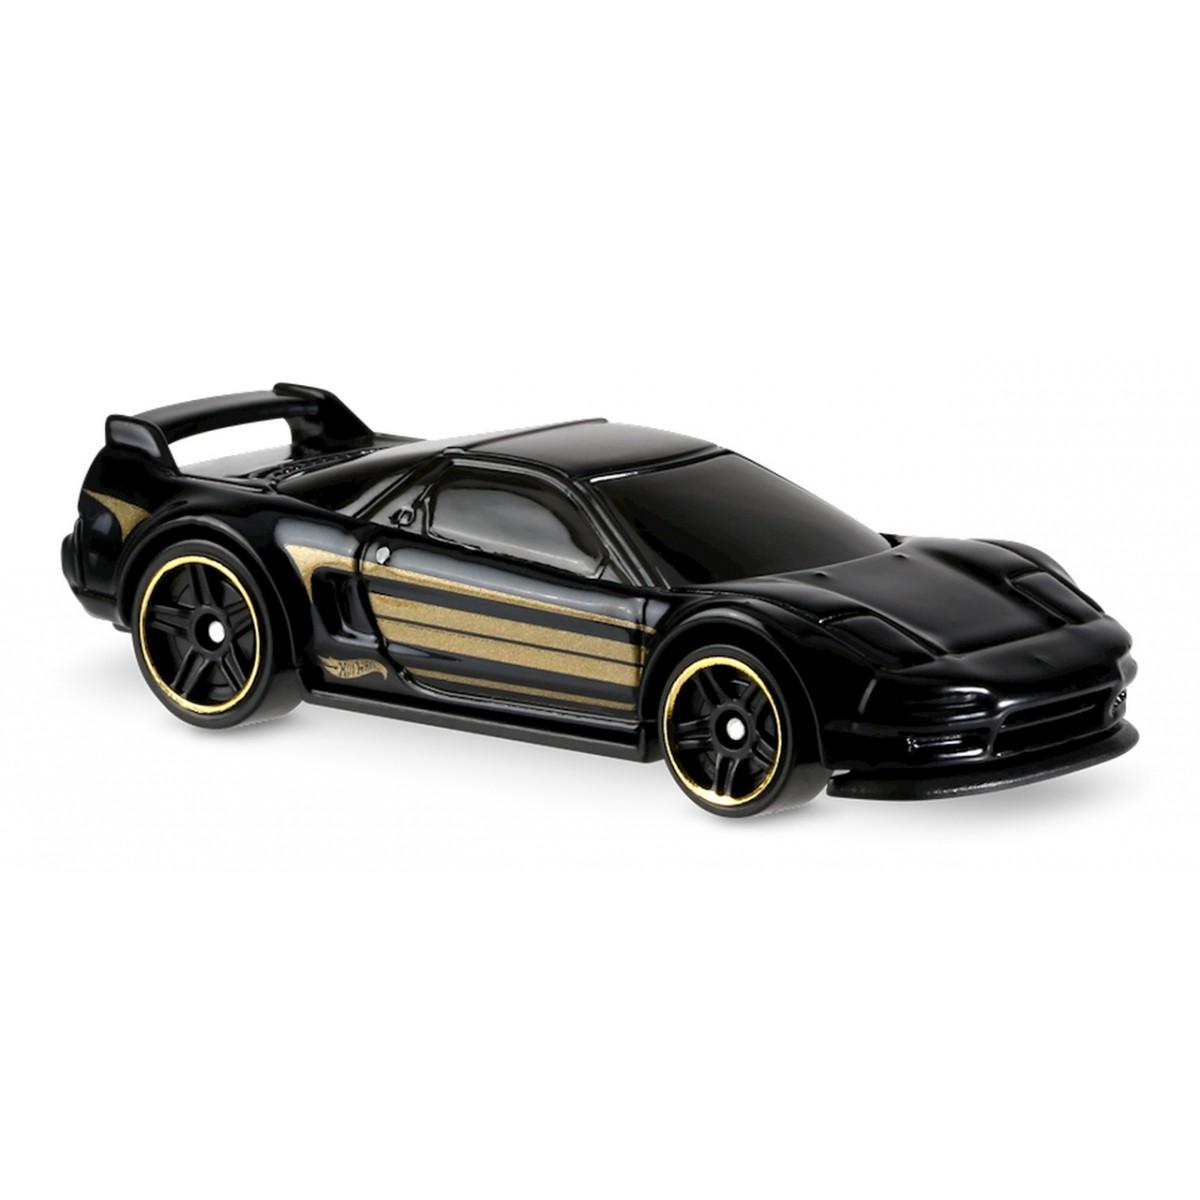 Carrinho Hot Wheels: '90 Acura NSX Preto